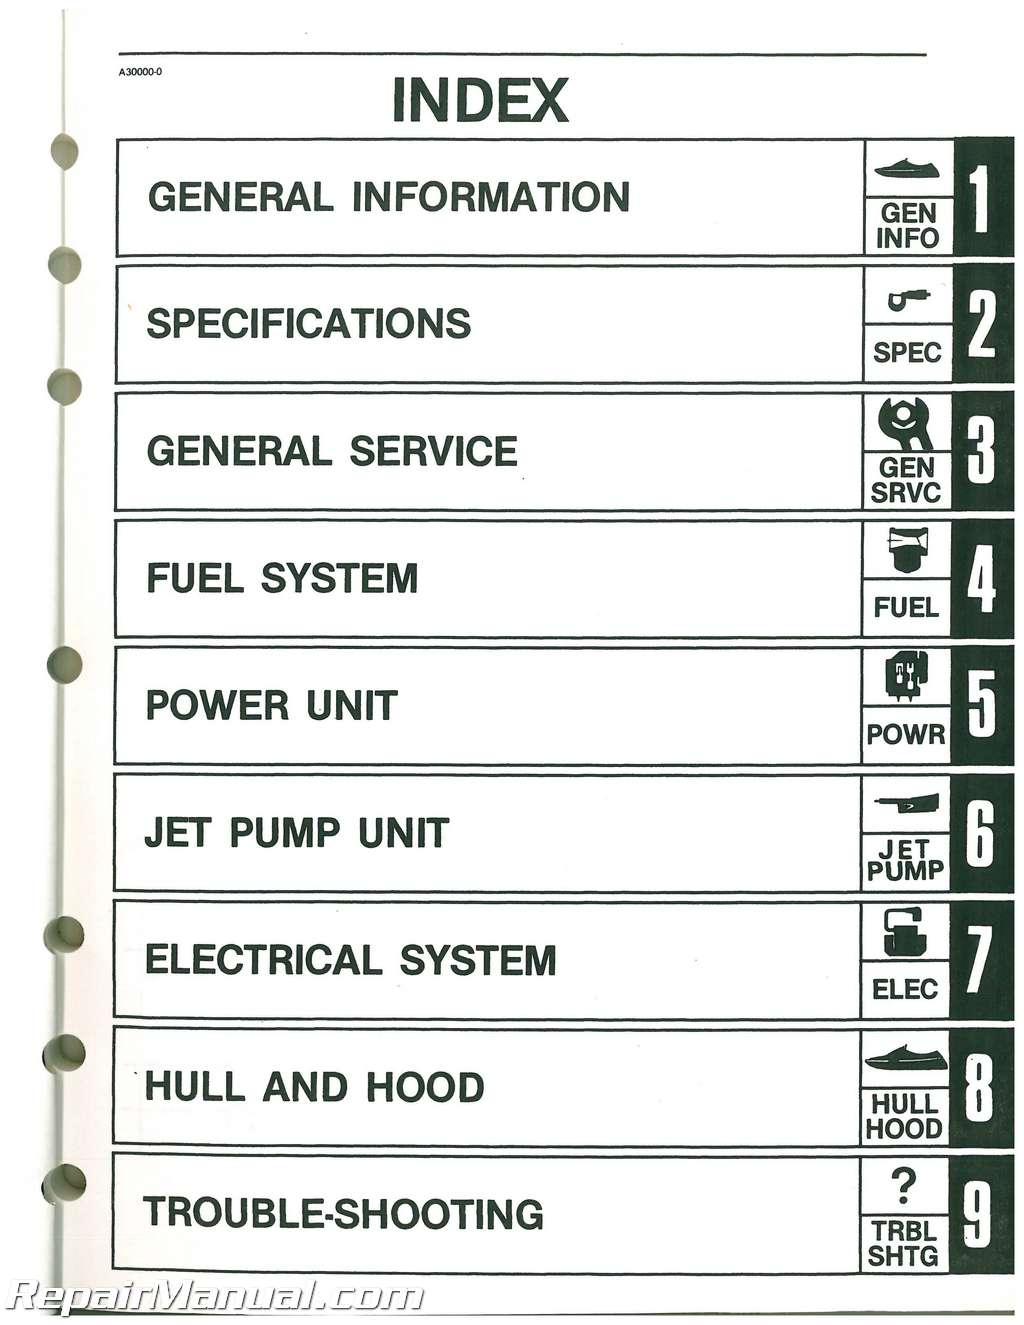 Service manual 96 waverunner 650